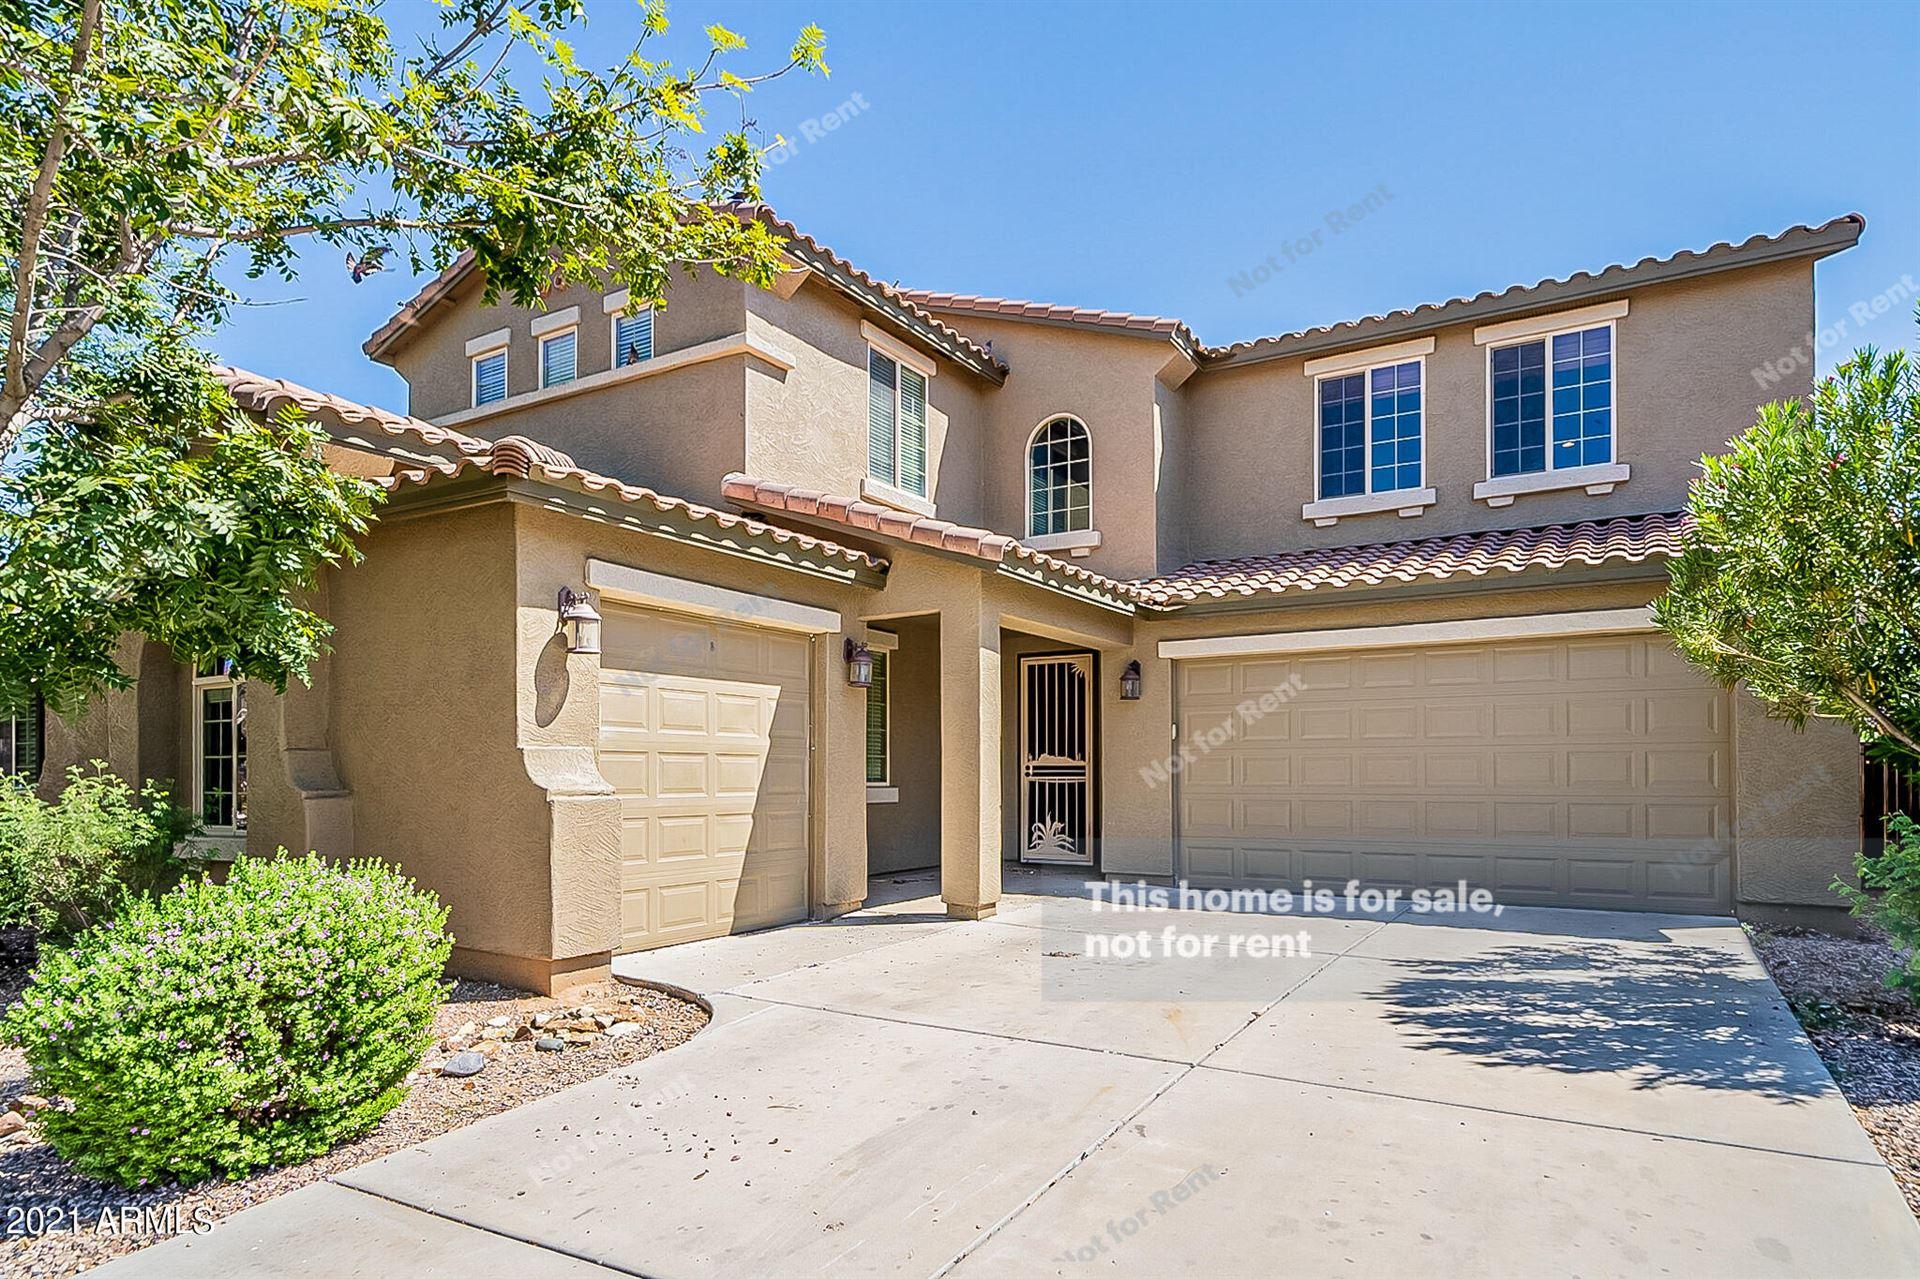 Photo for 42515 W CORVALIS Lane, Maricopa, AZ 85138 (MLS # 6286077)